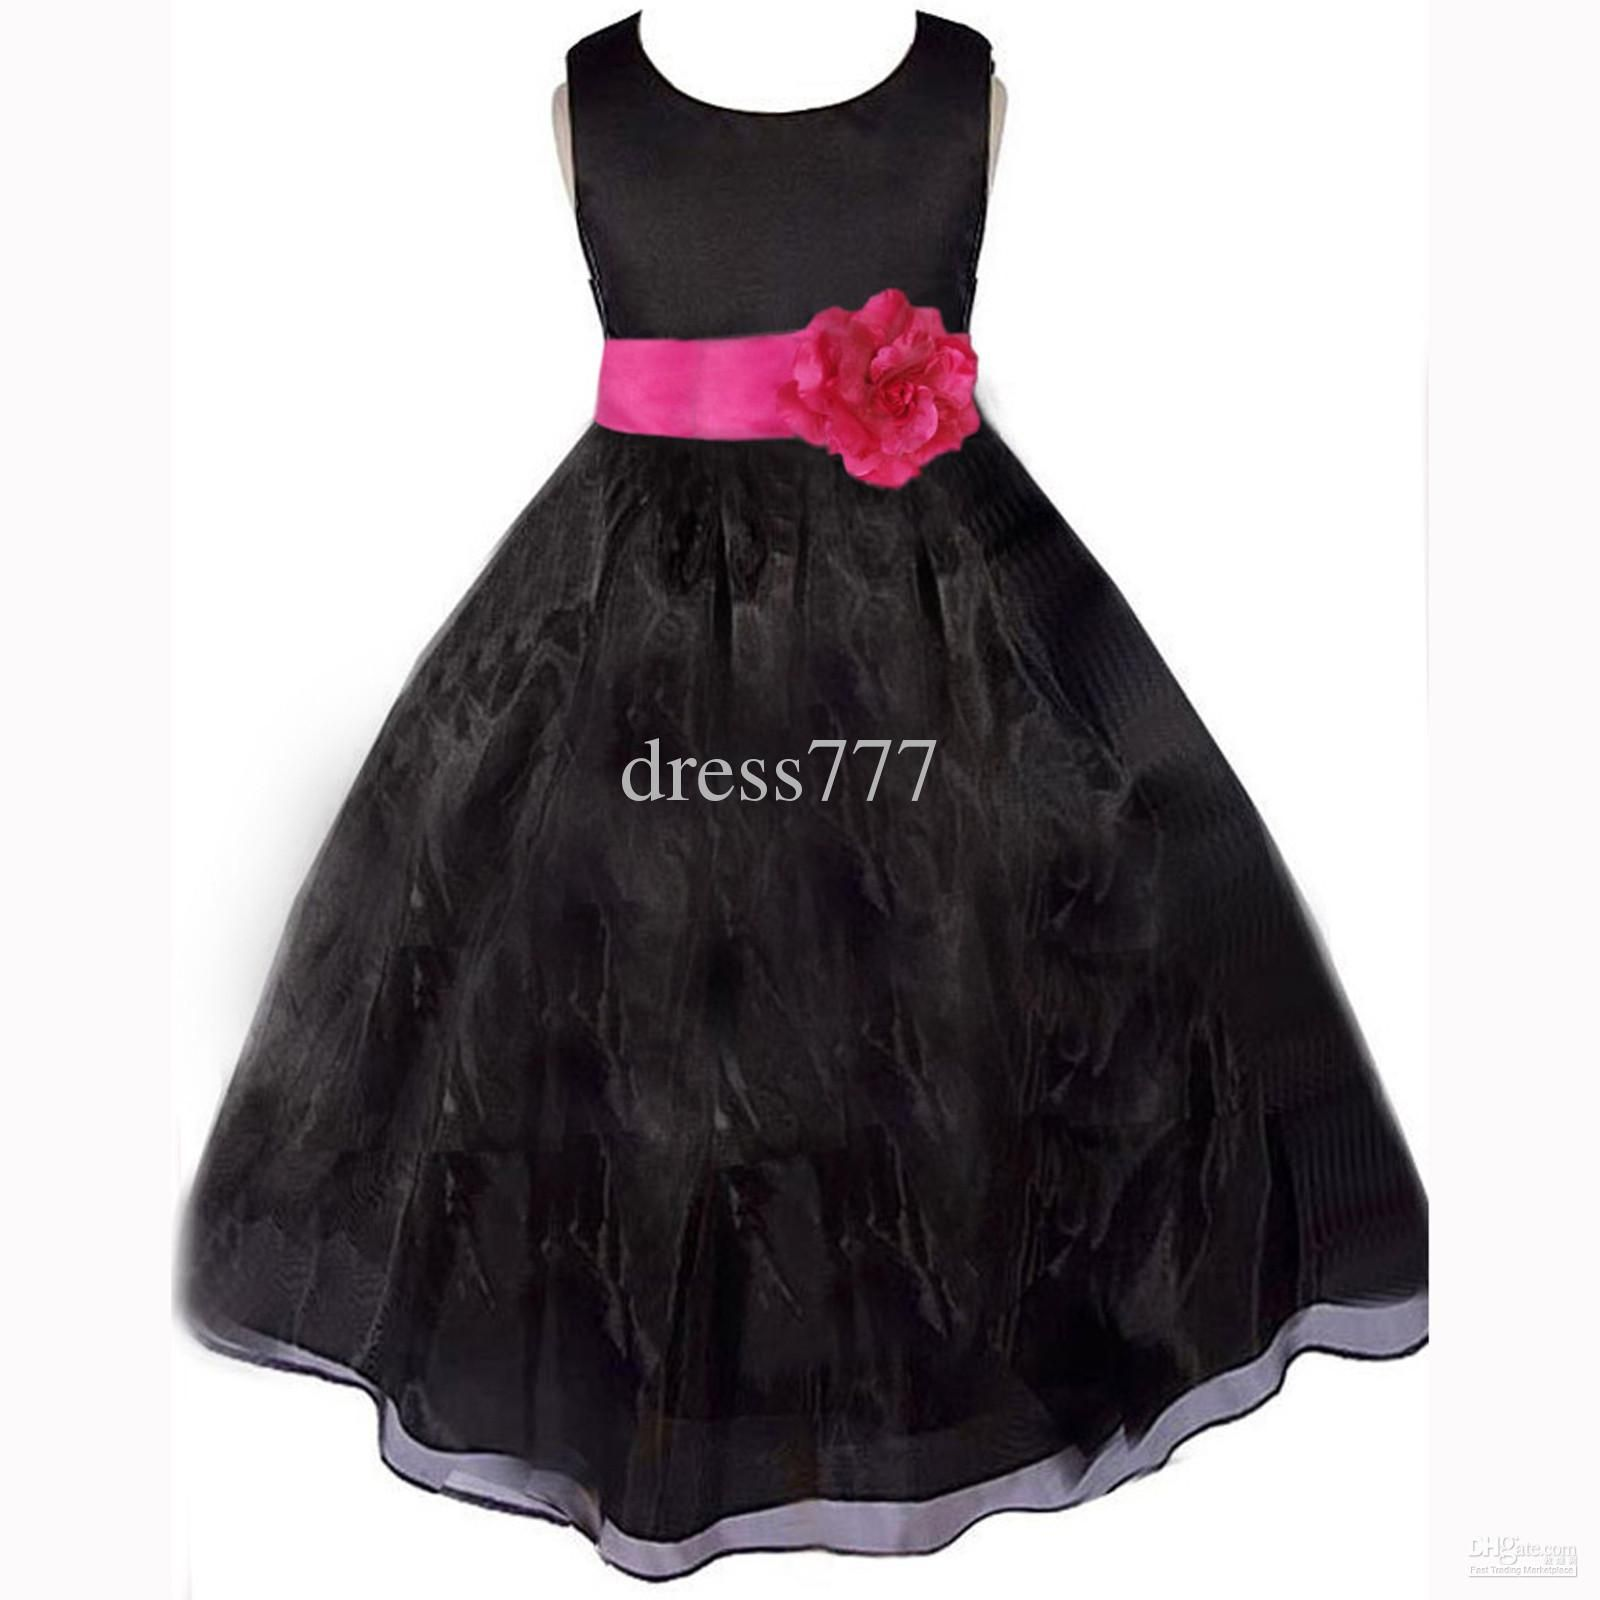 Wholesale girl dress buy black fuchsia hot pink bridal wedding wholesale girl dress buy black fuchsia hot pink bridal wedding formal flower girl dress 12 ombrellifo Gallery